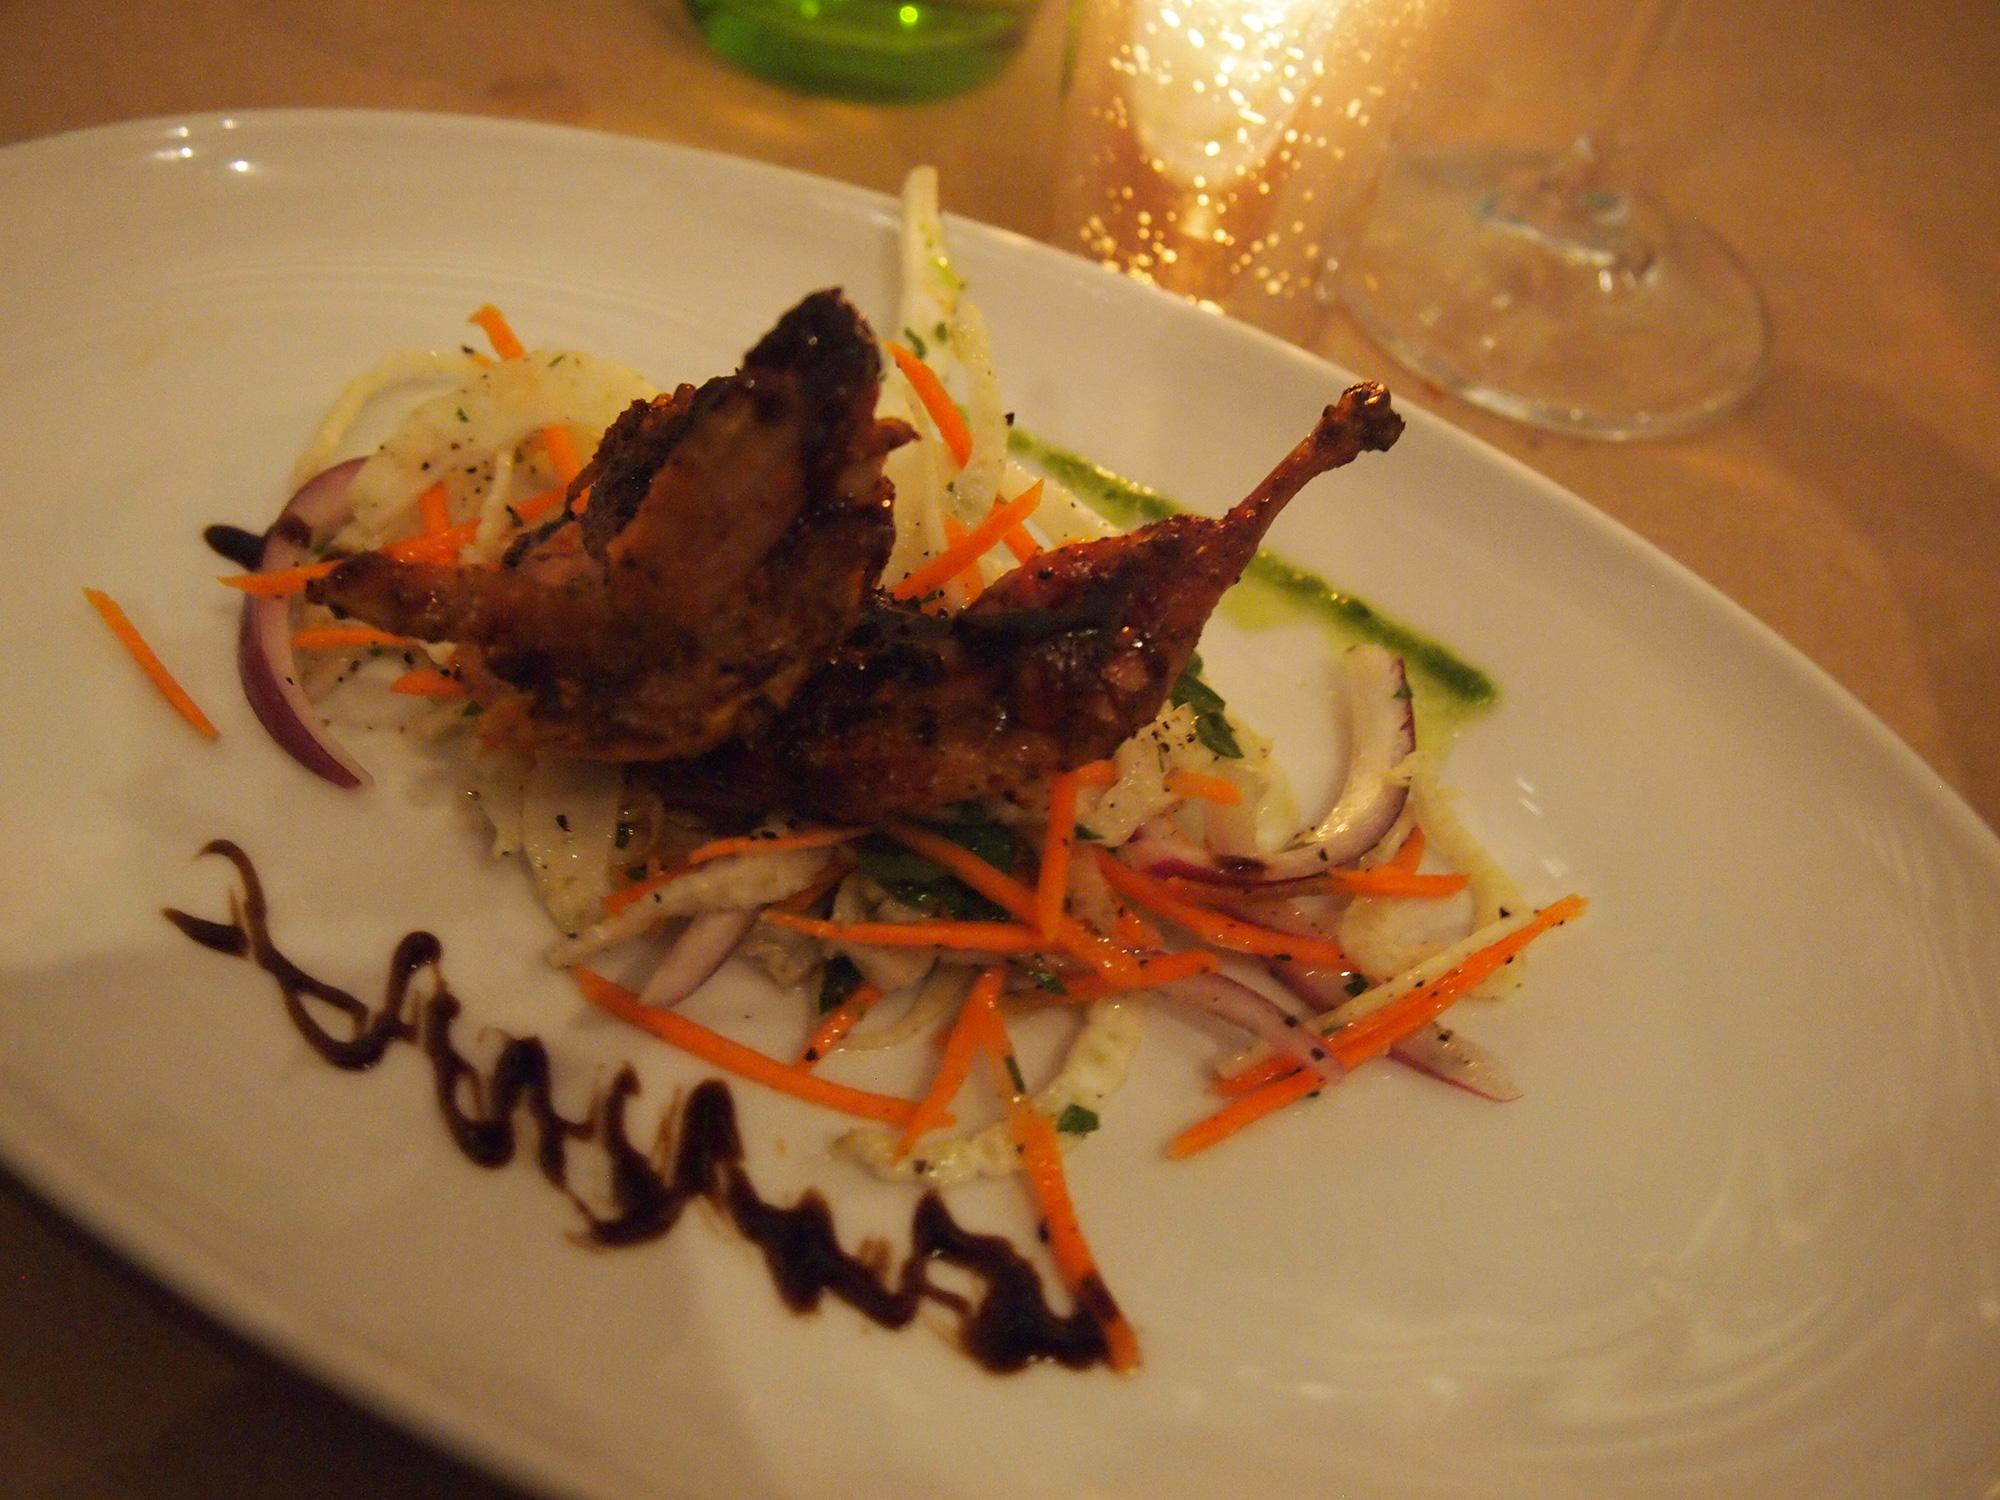 MKT – Italian seaside dining experience?